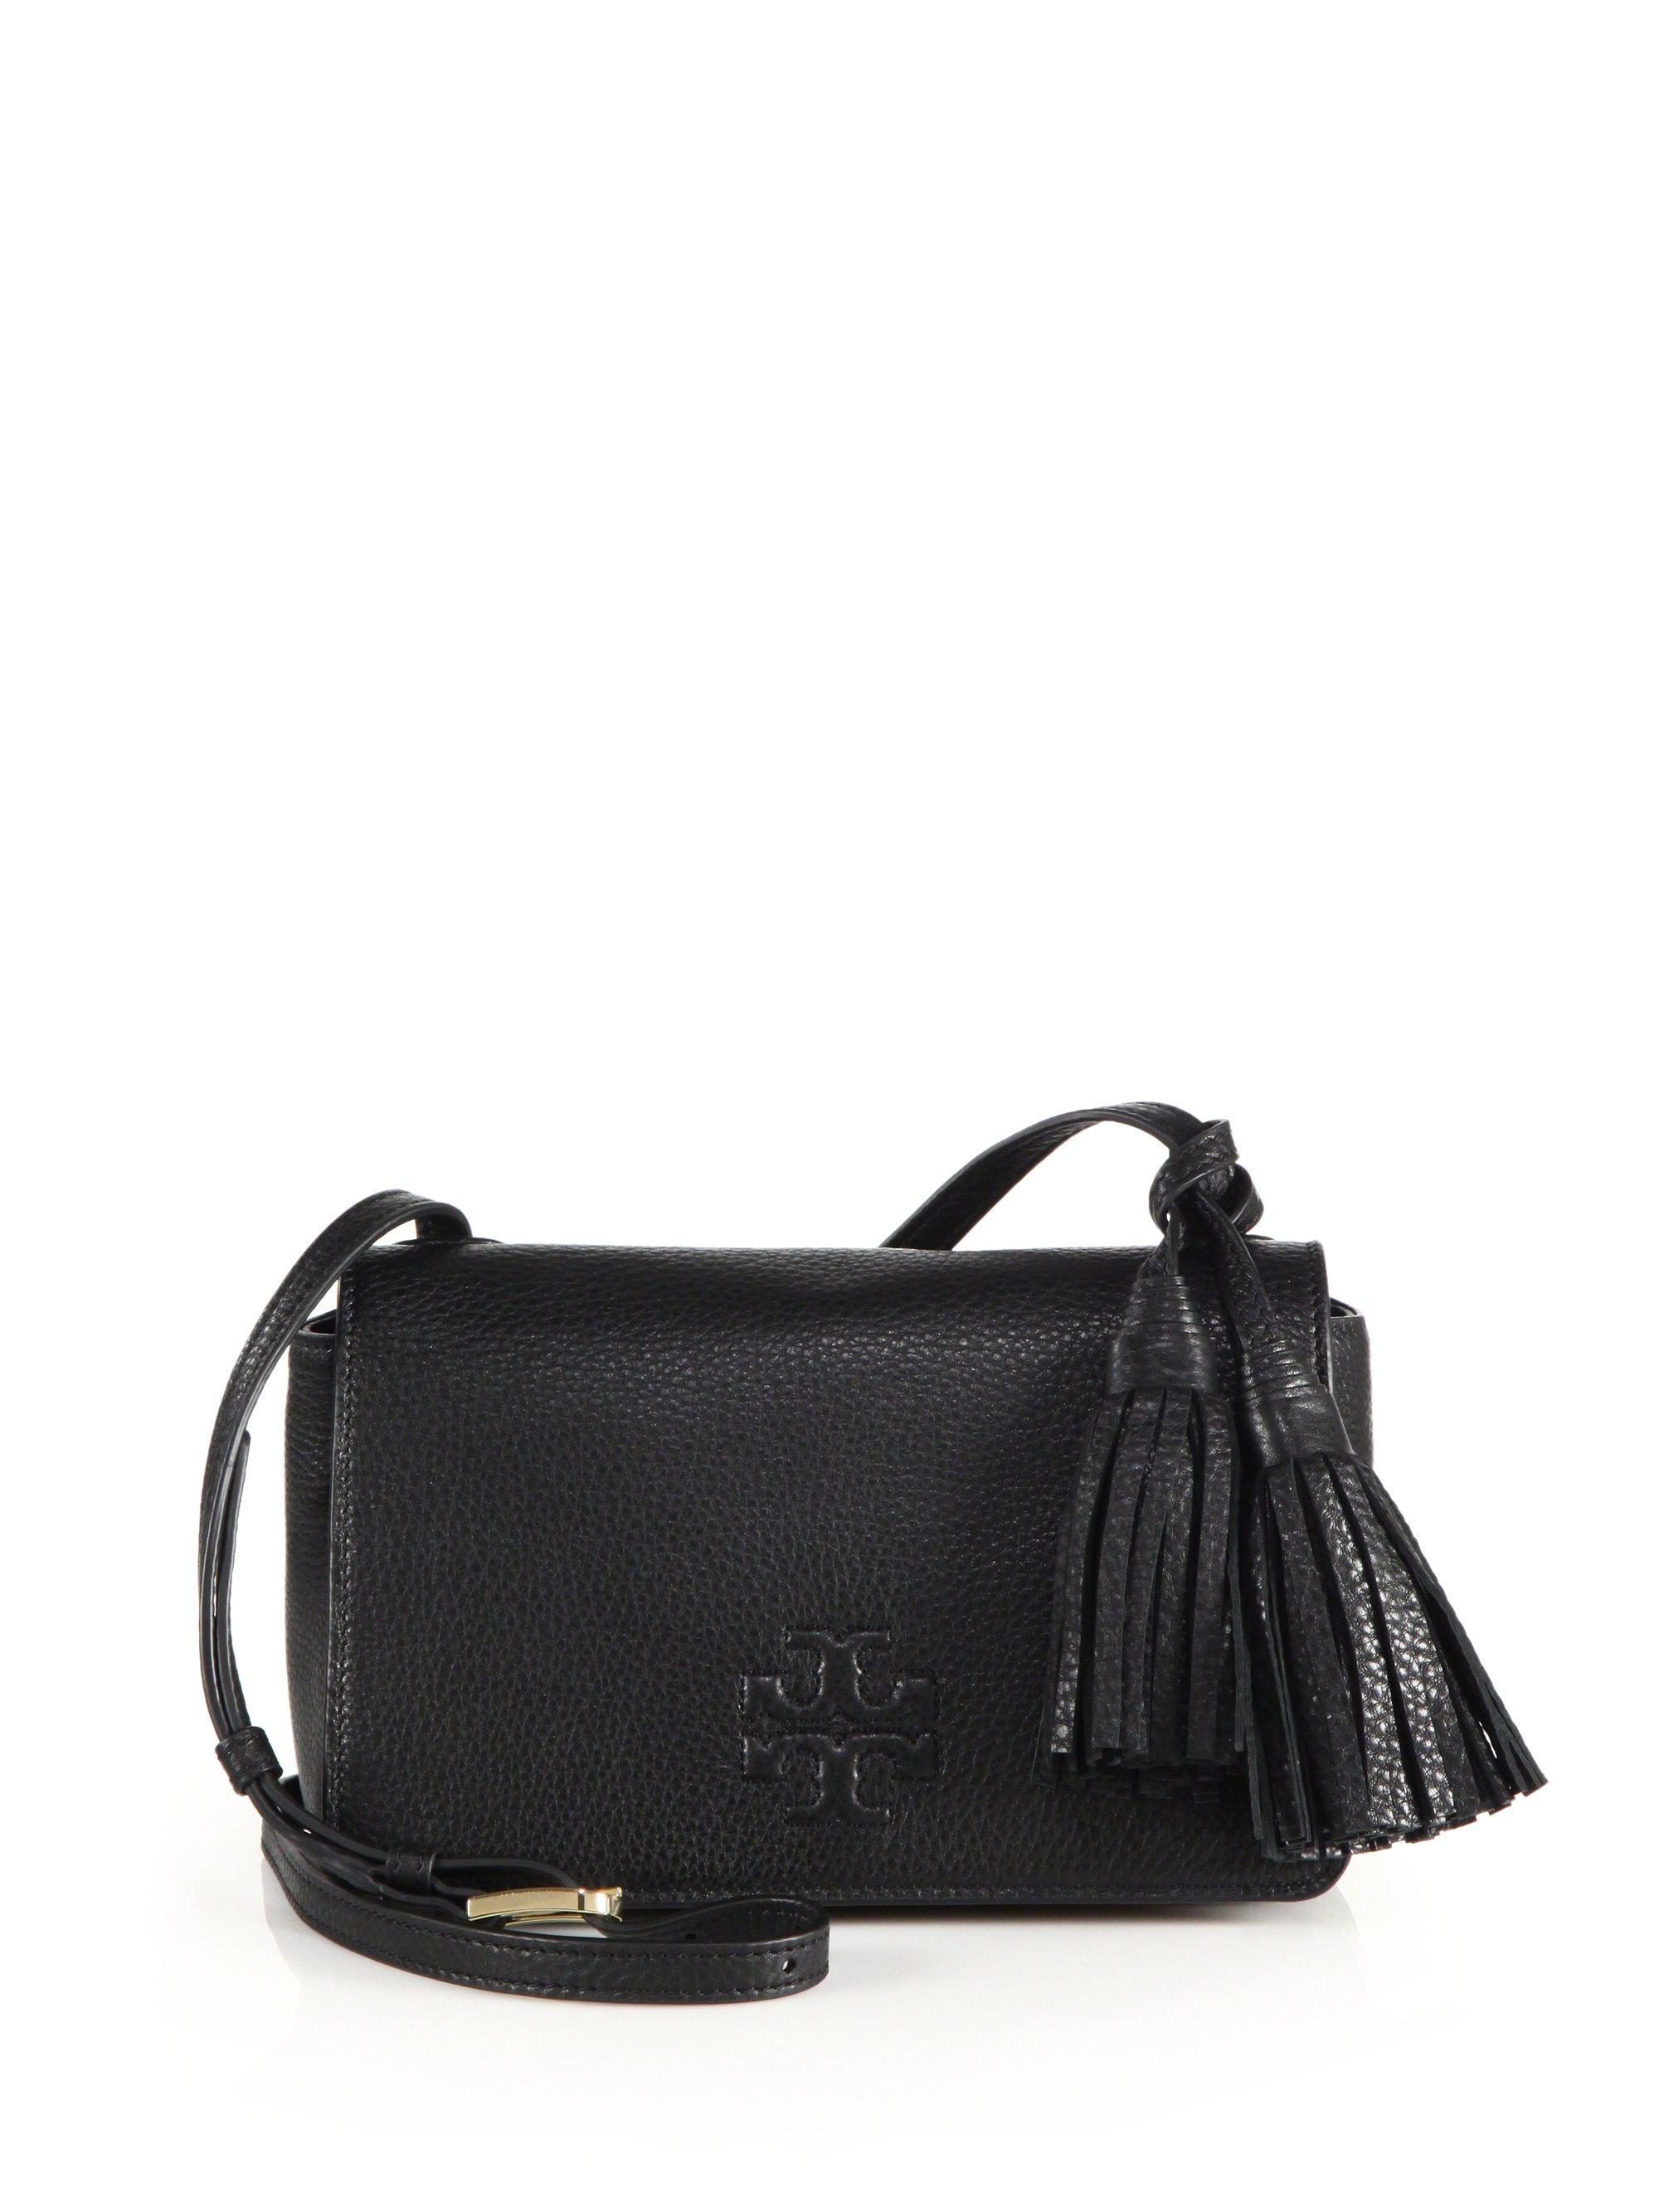 44ccf0051b5 Lyst - Tory Burch Thea Mini Leather Tassel Crossbody Bag in Black